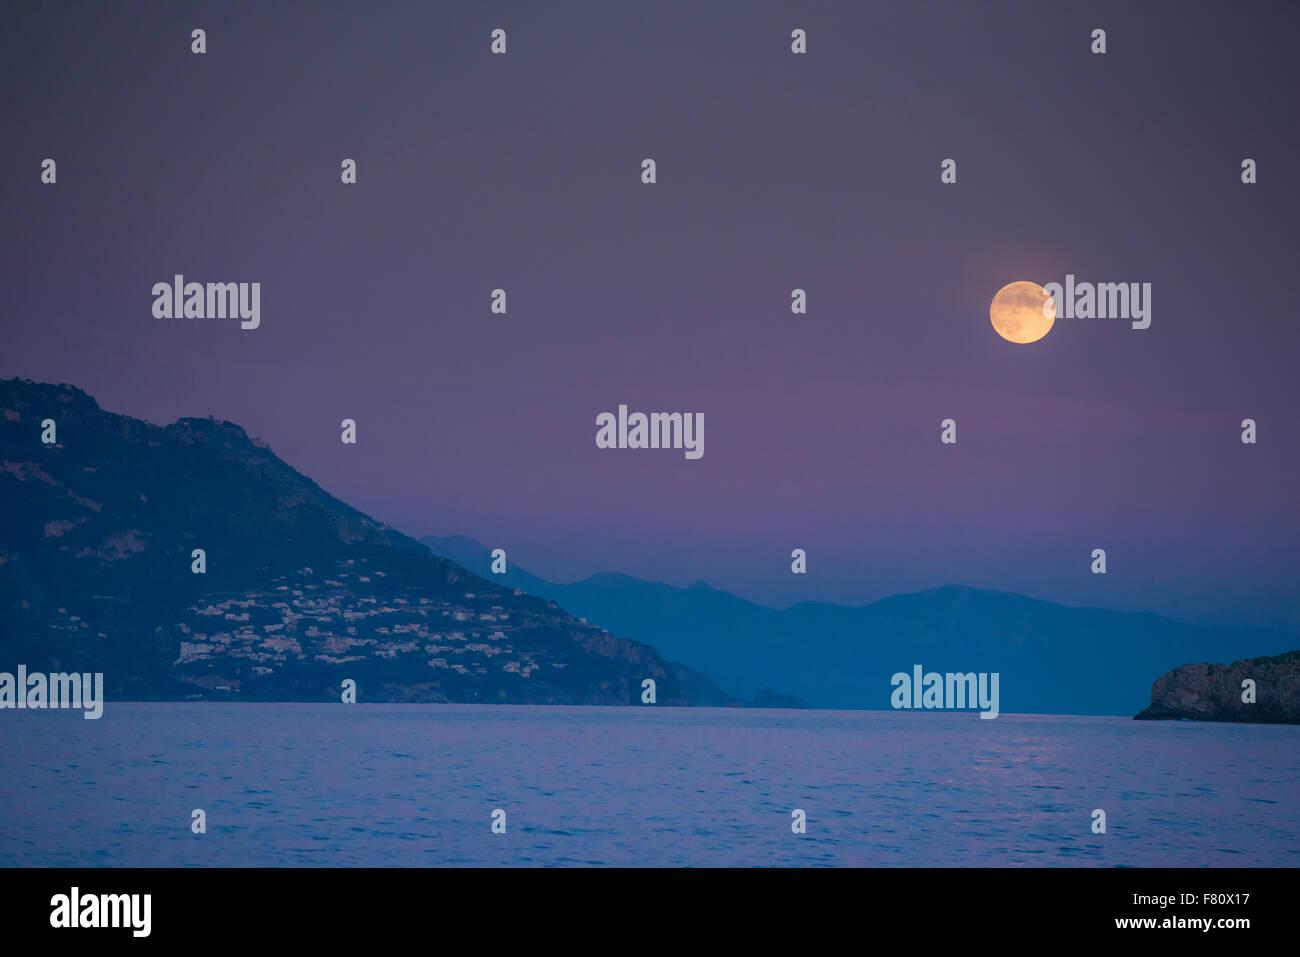 Moonrise over Amalfi Coast. Italy, Gulf of Salerno adn Tyrrhenian Sea - Stock Image